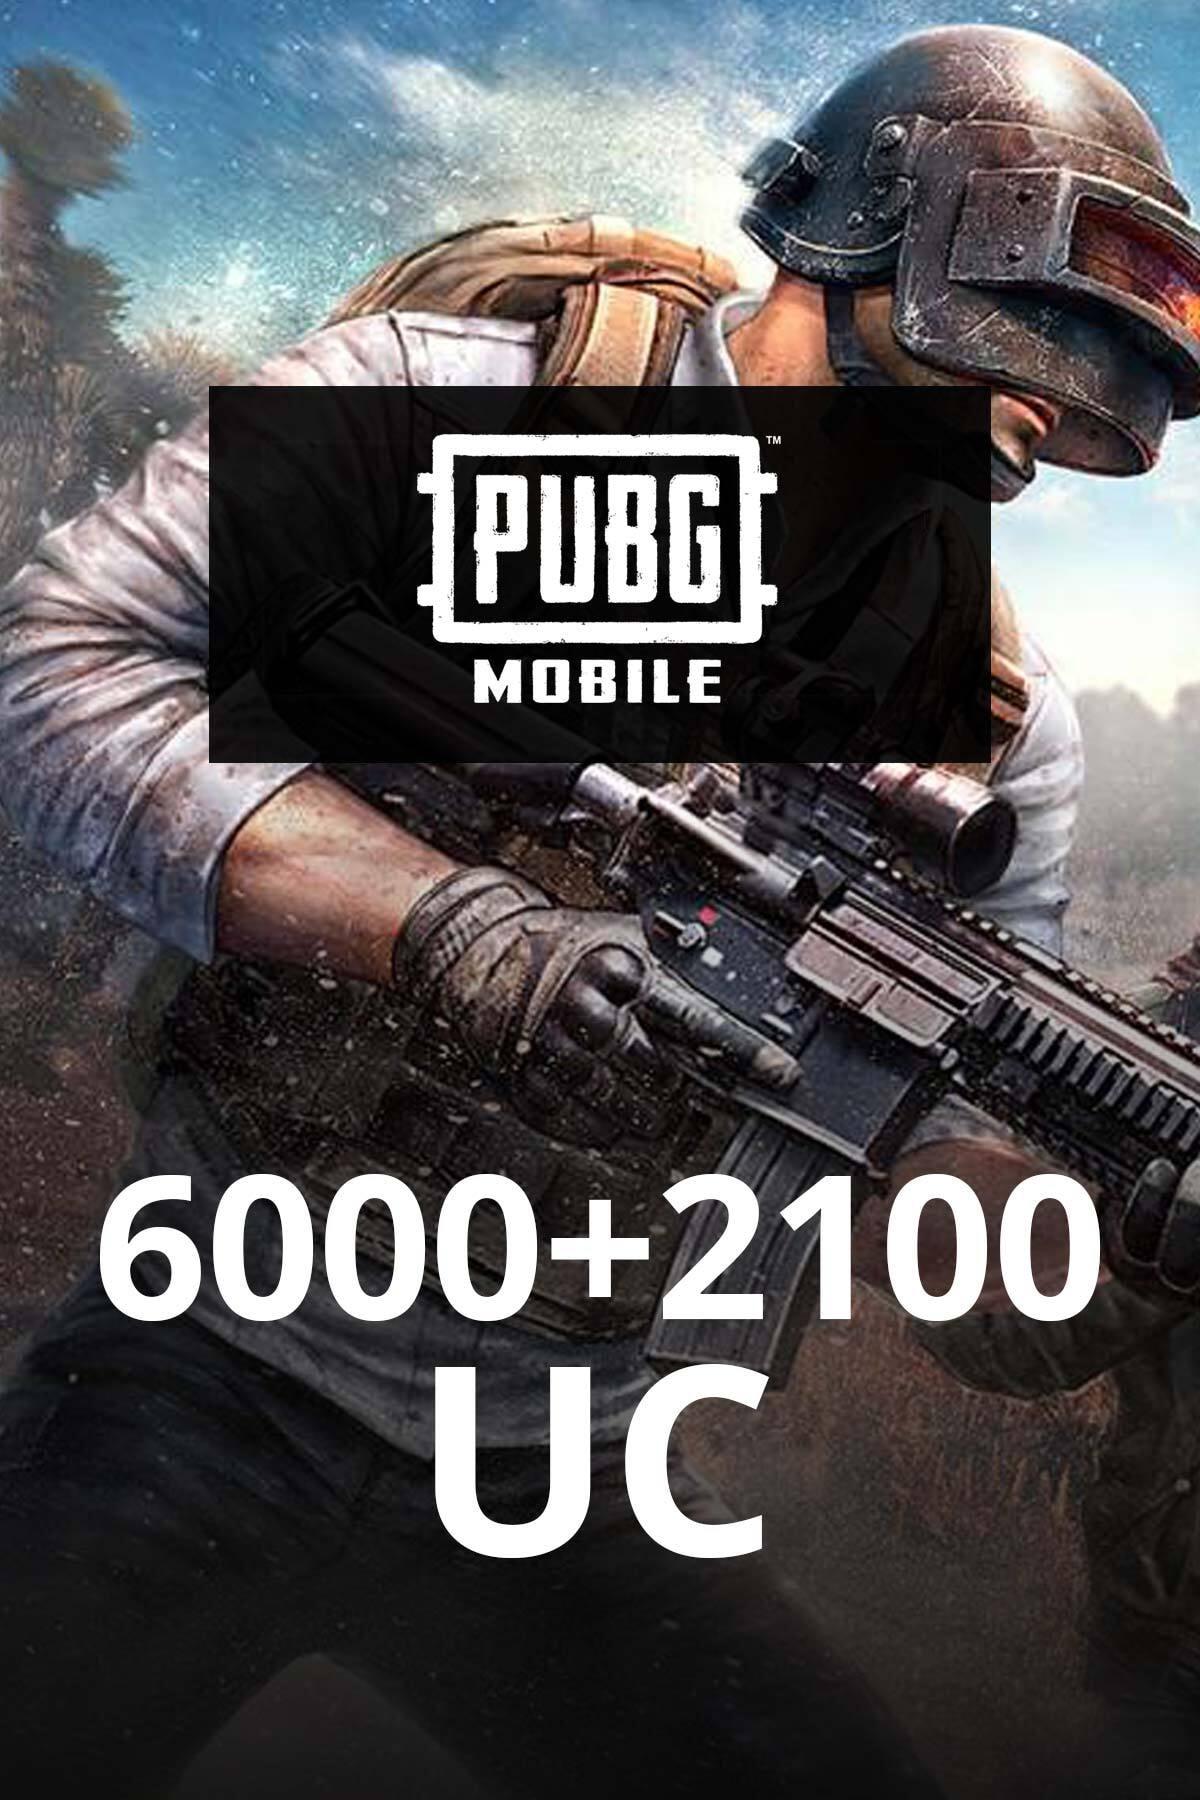 PUBG Mobile 6000 +2100 UC